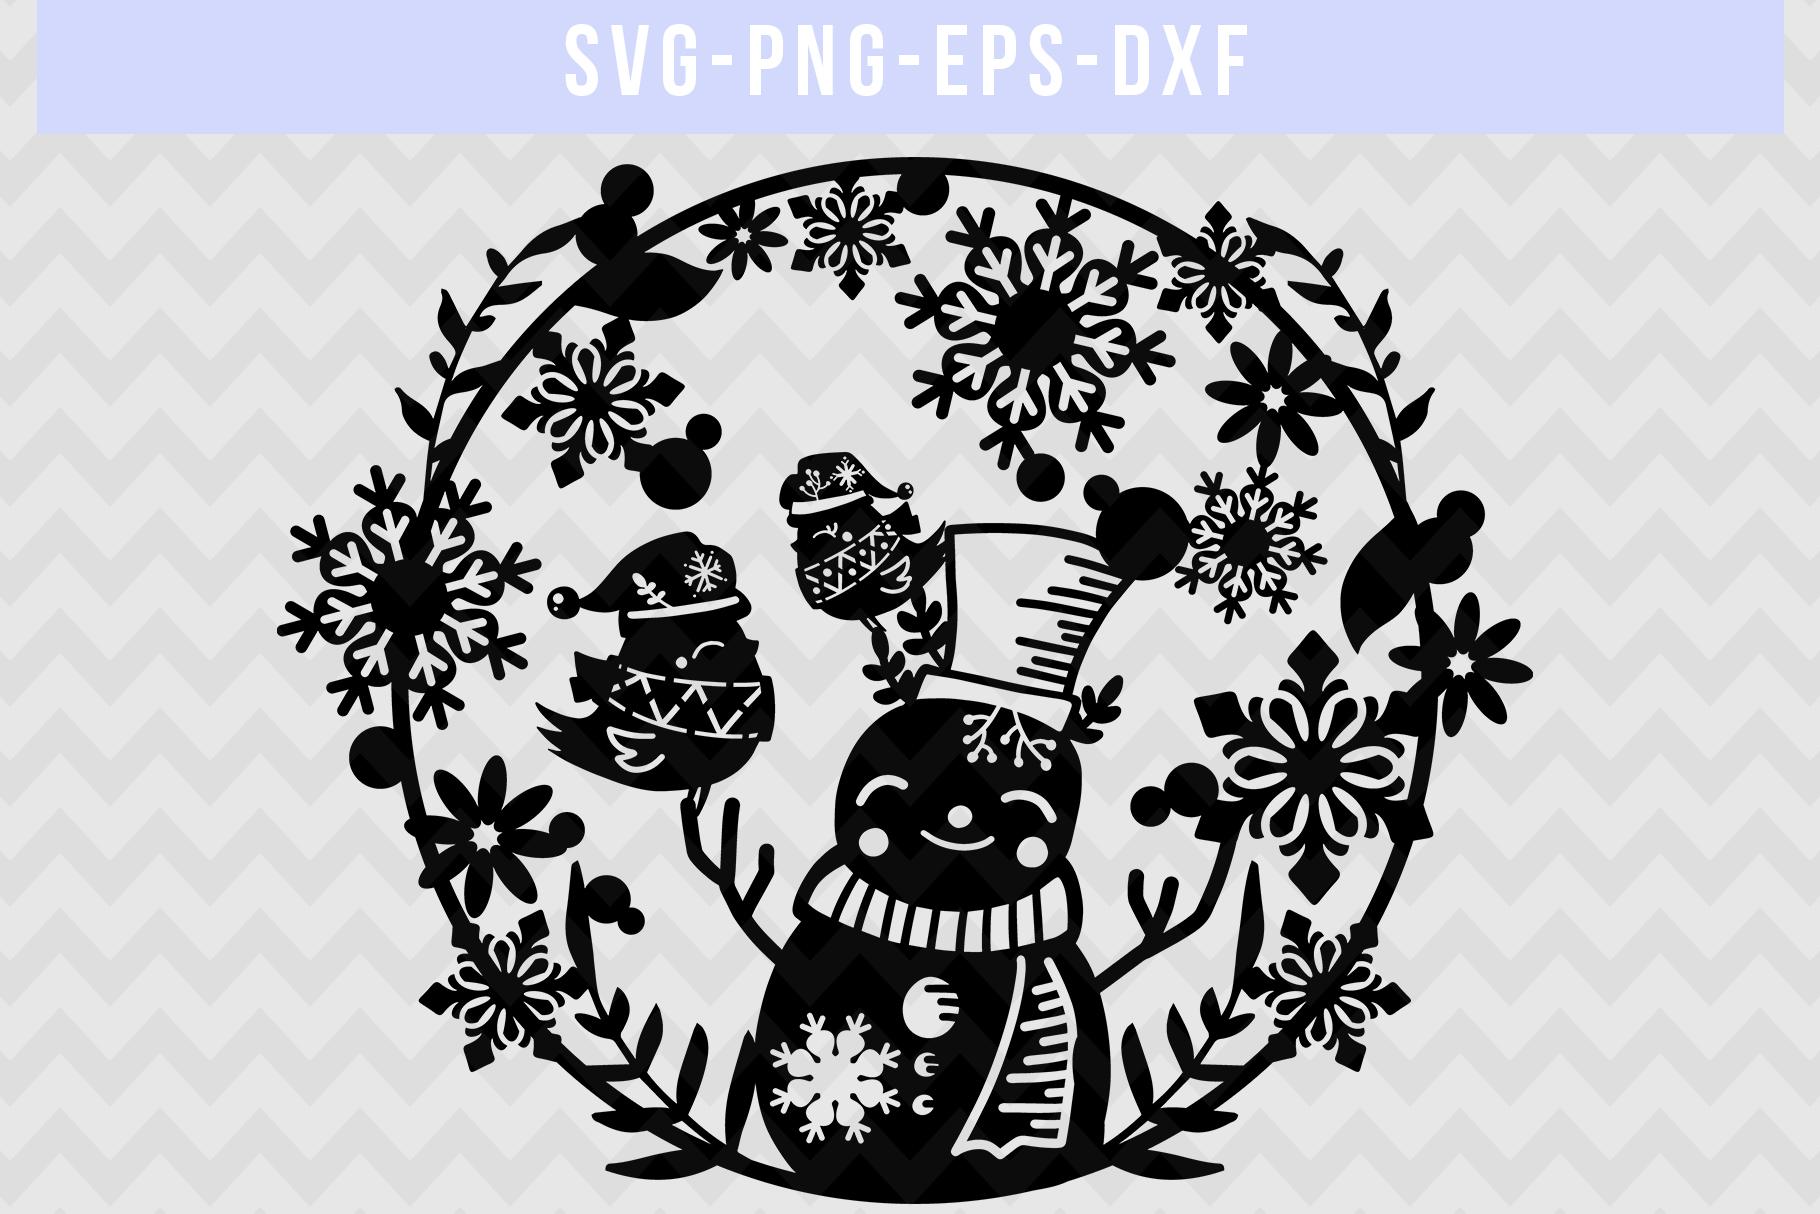 Winter SVG Cut File, Snowflake Papercut, Snowman Laser Cut example image 2